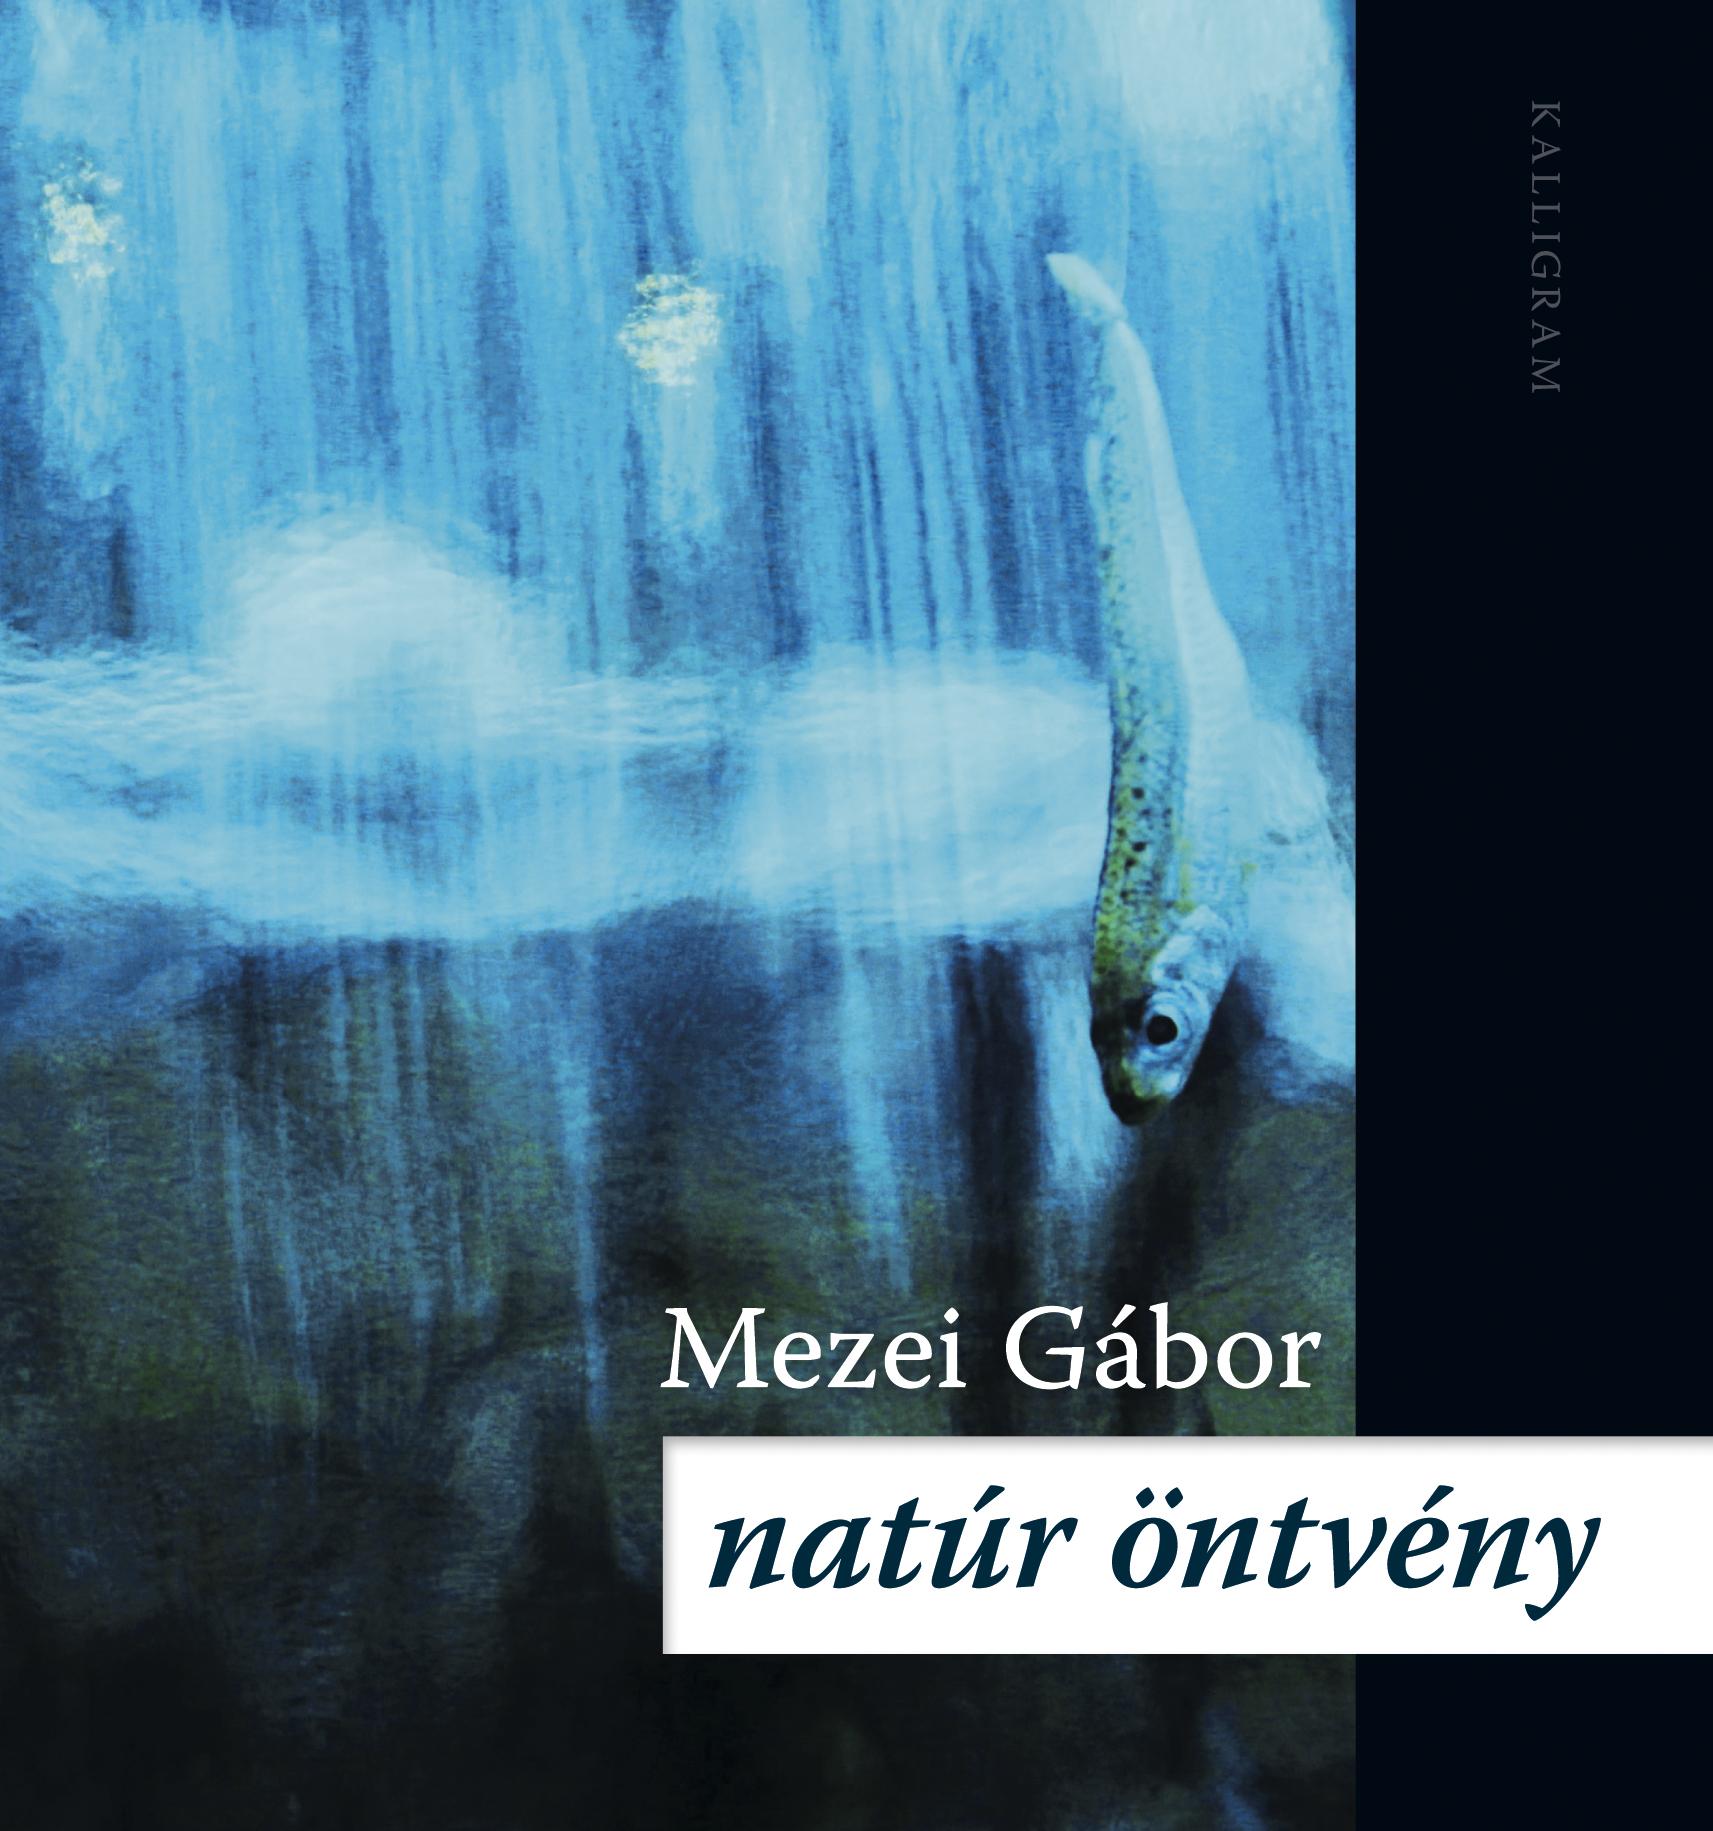 MEZEI-G_Natur ontveny_COVER.indd